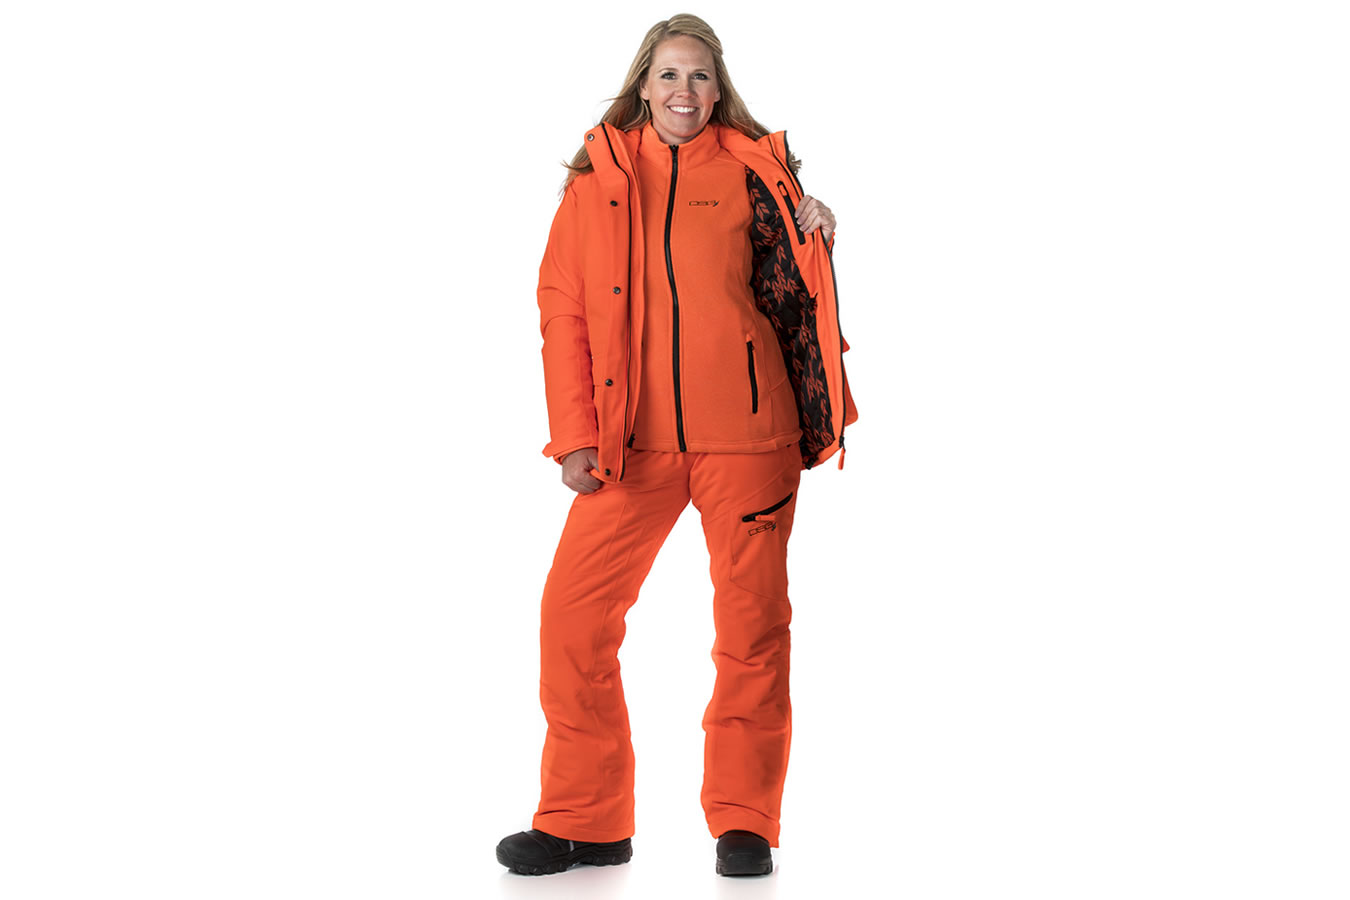 3b6242b4c43e1 Dsg Outerwear Kylie 3-in-1 Hunting Jacket - Blaze Orange- Small ...